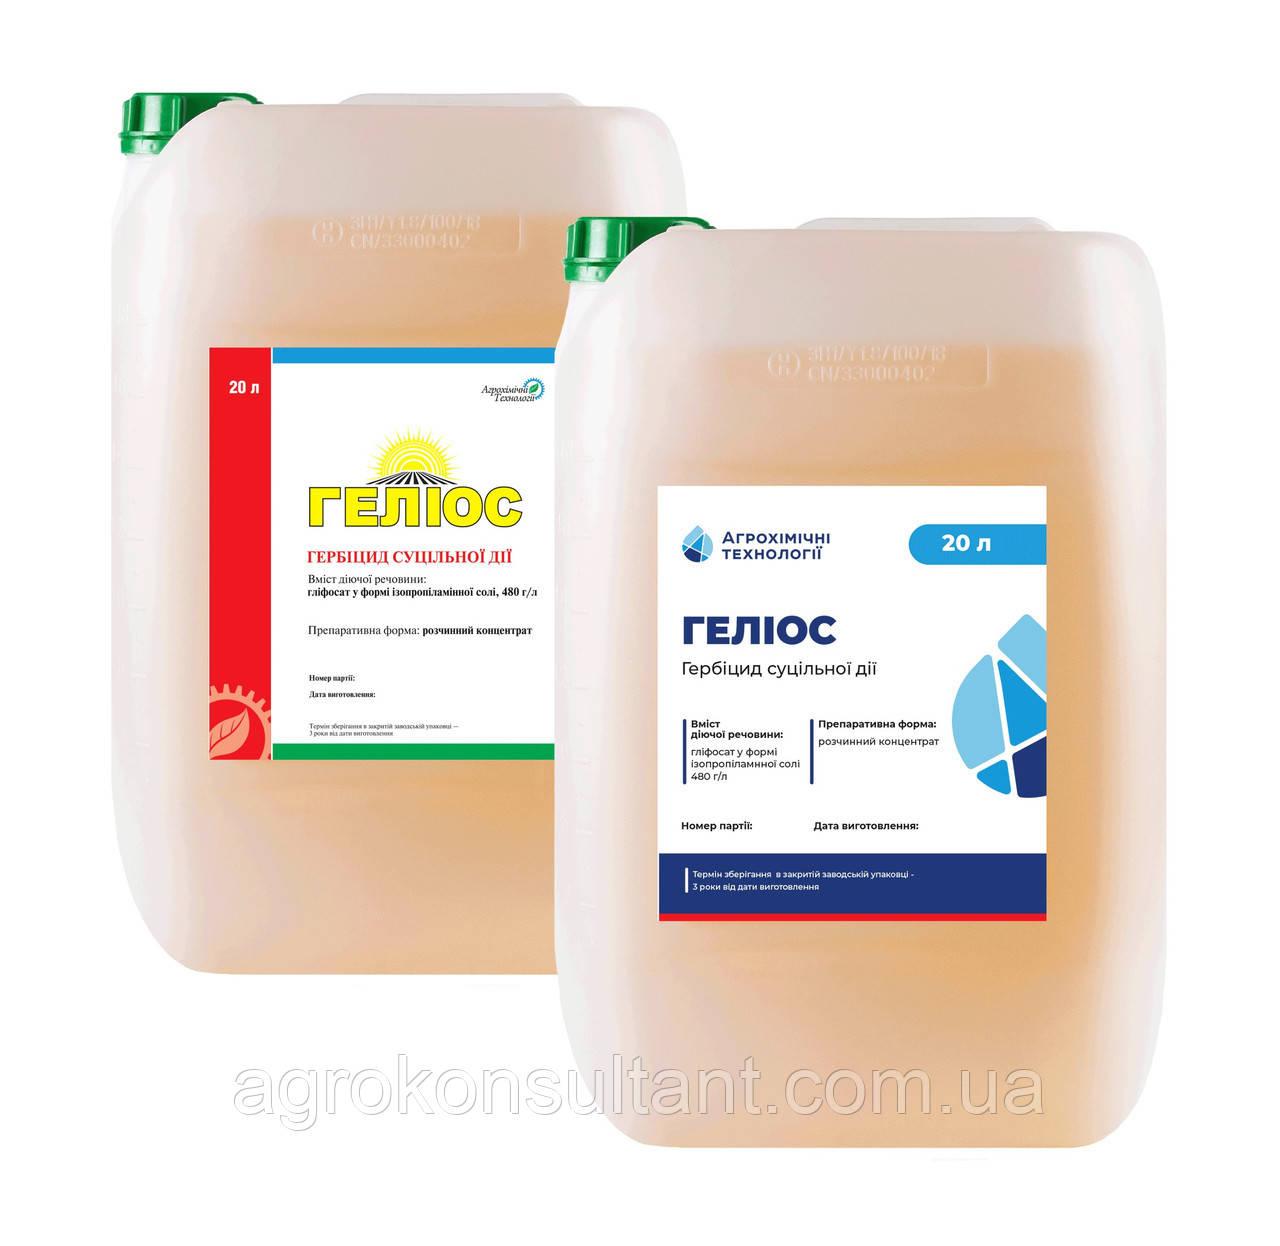 Геліос (аналог Раундапу) 20л - СУЦІЛЬНИЙ гербіцид (ізопропіламінна сіль гліфосату — 480 г/л), АХТ